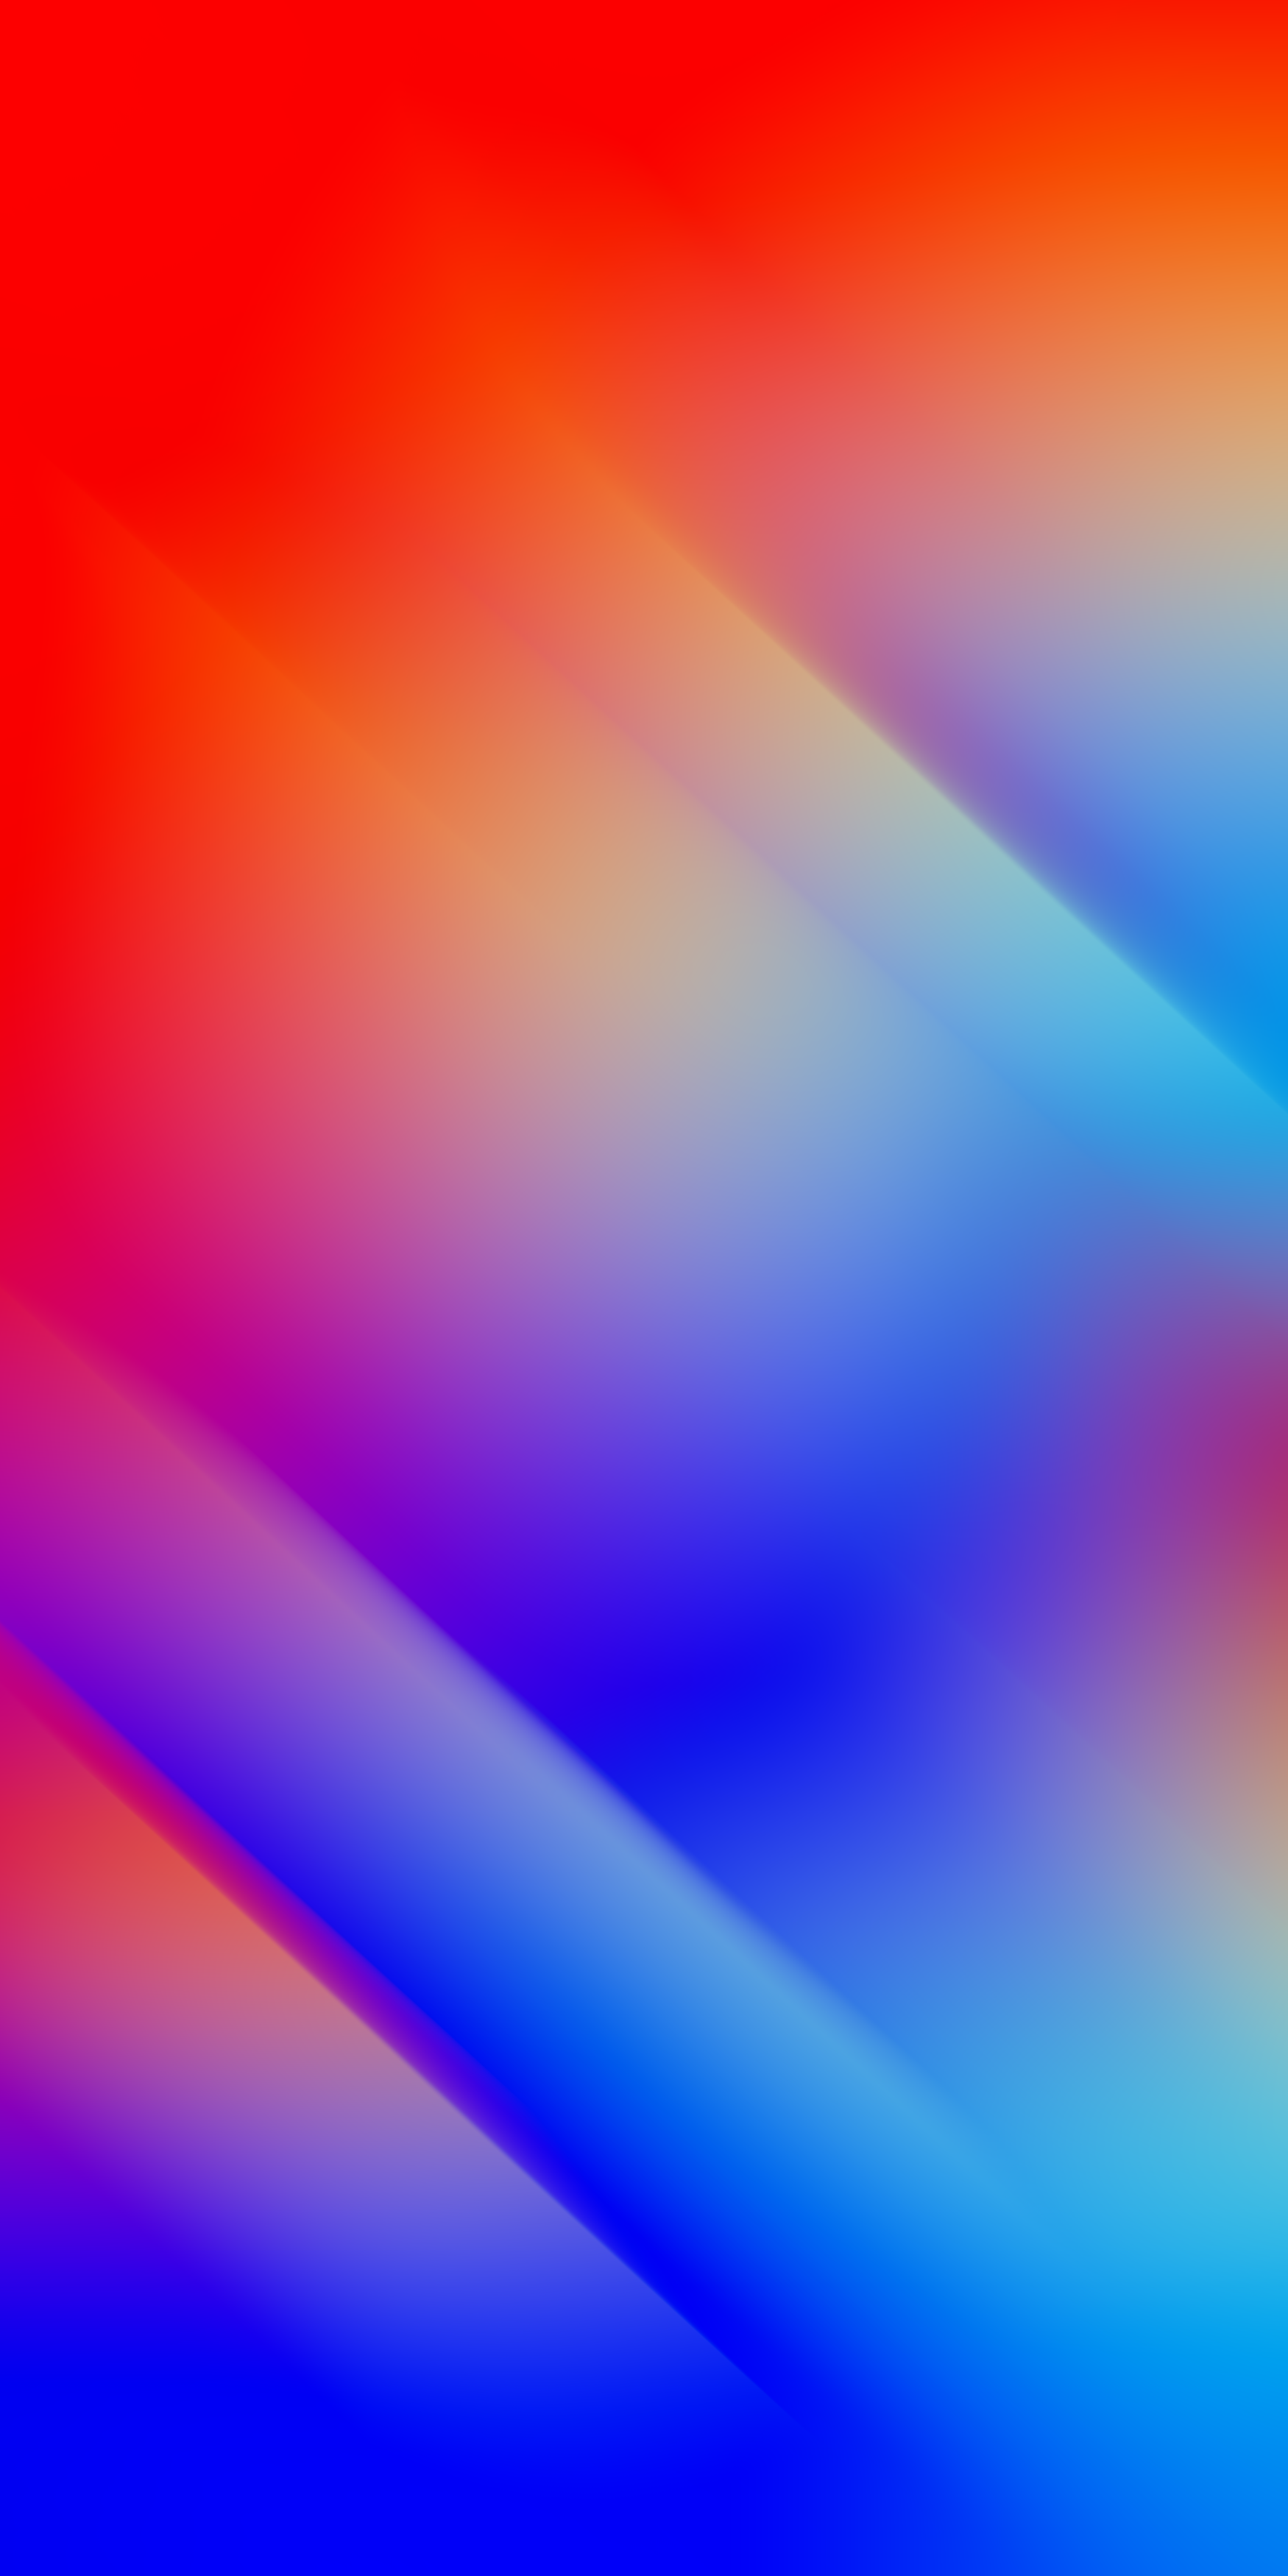 Обои streak, blue. Абстракции foto 2